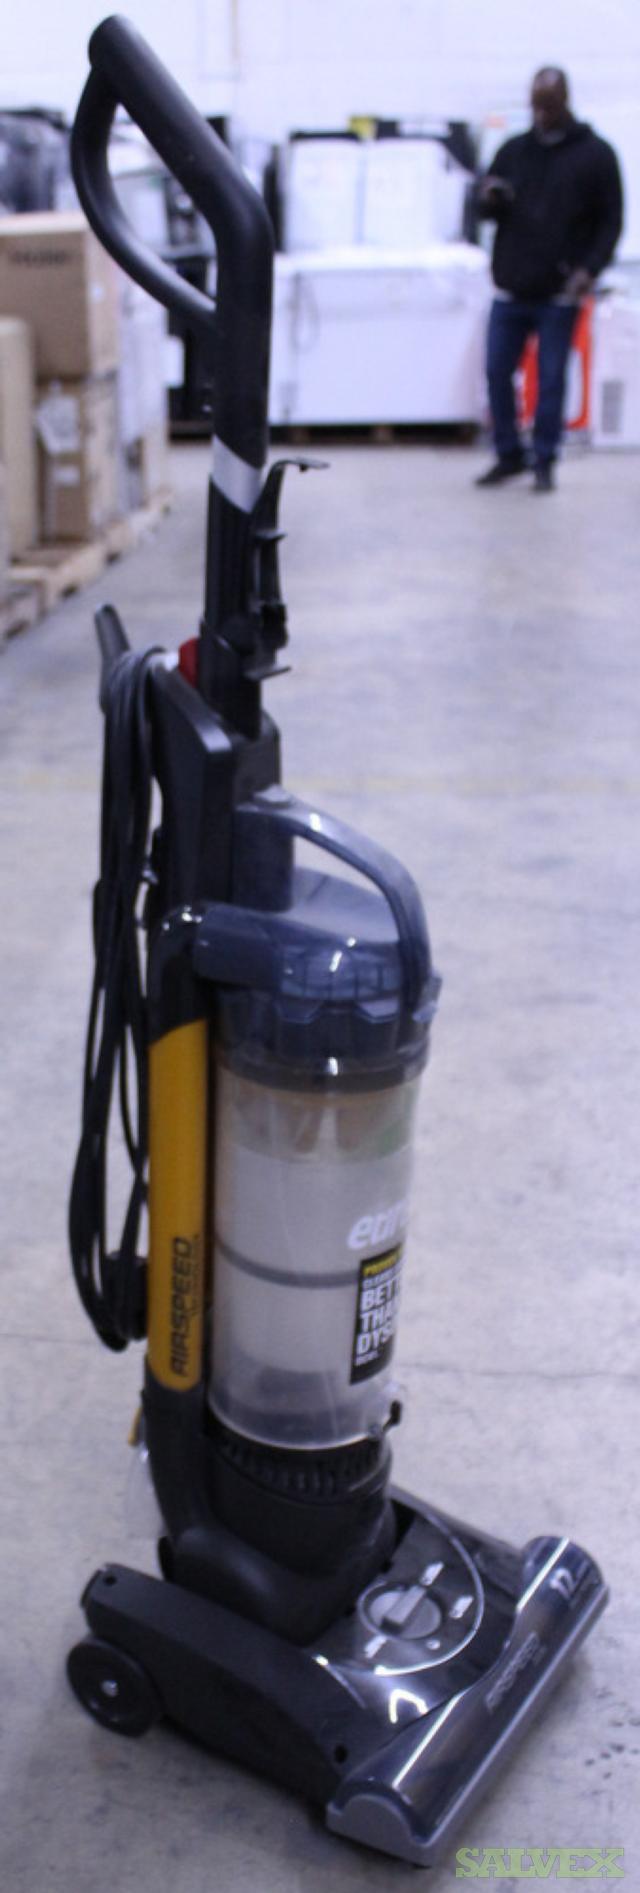 Vacuum Cleaners: Turbulenz, Pelonis, Eureka, Dirt Devil, Bissell, etc. (1376 Units) in Pennsylvania